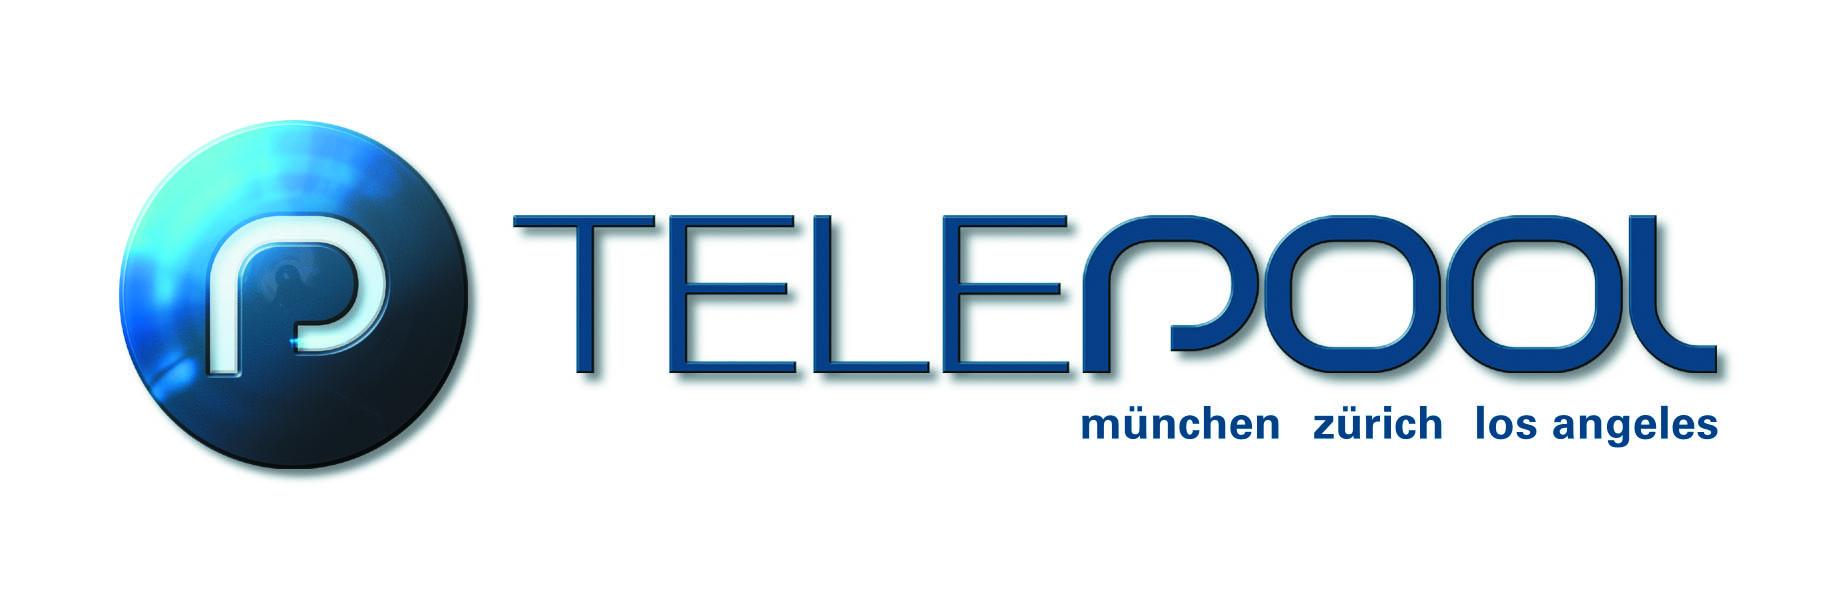 Telepool GmbH